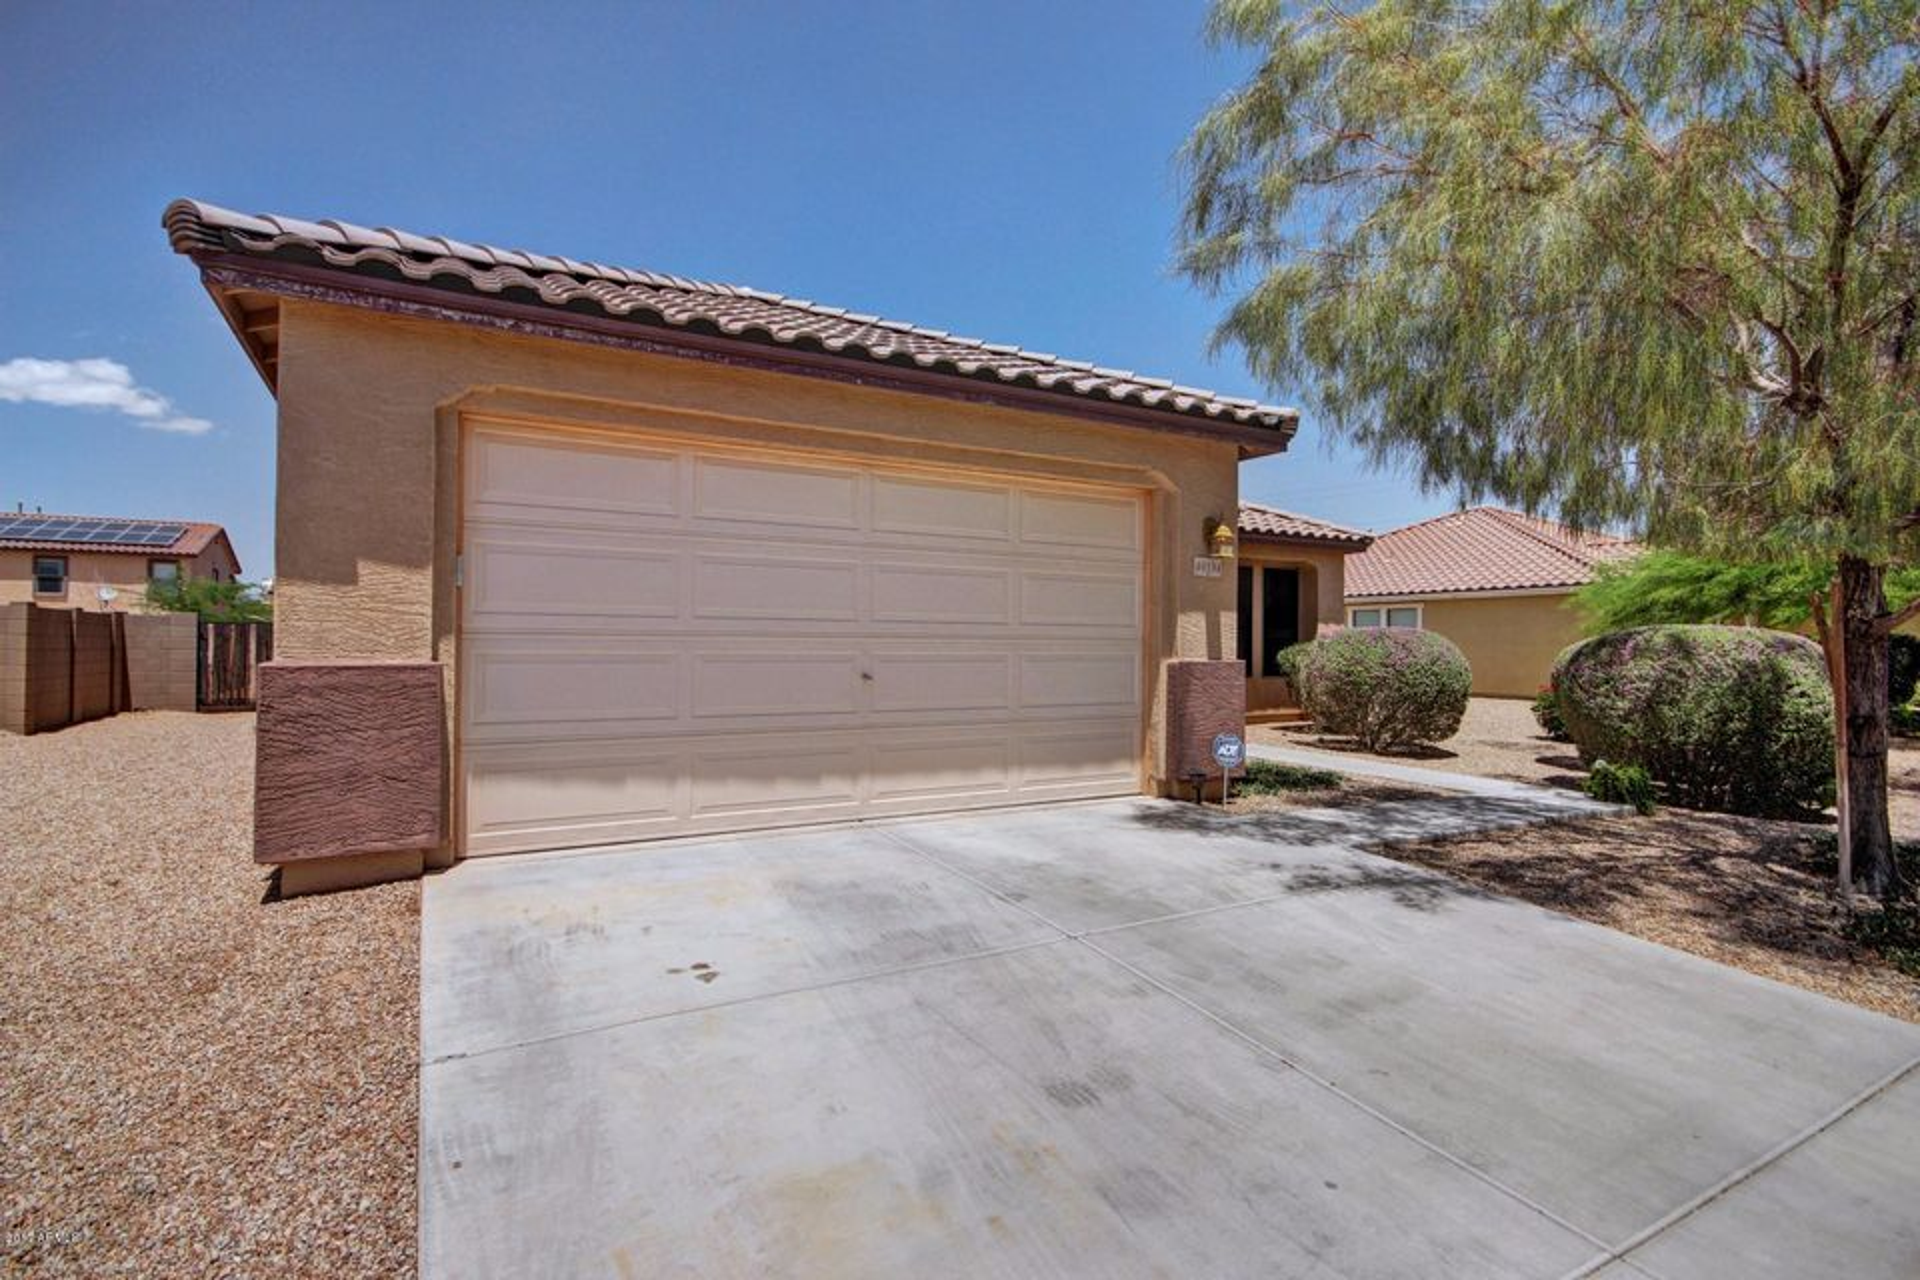 MLS 5606015 40194 W LOCOCO Street, Maricopa, AZ 85138 Maricopa AZ Smith Farms